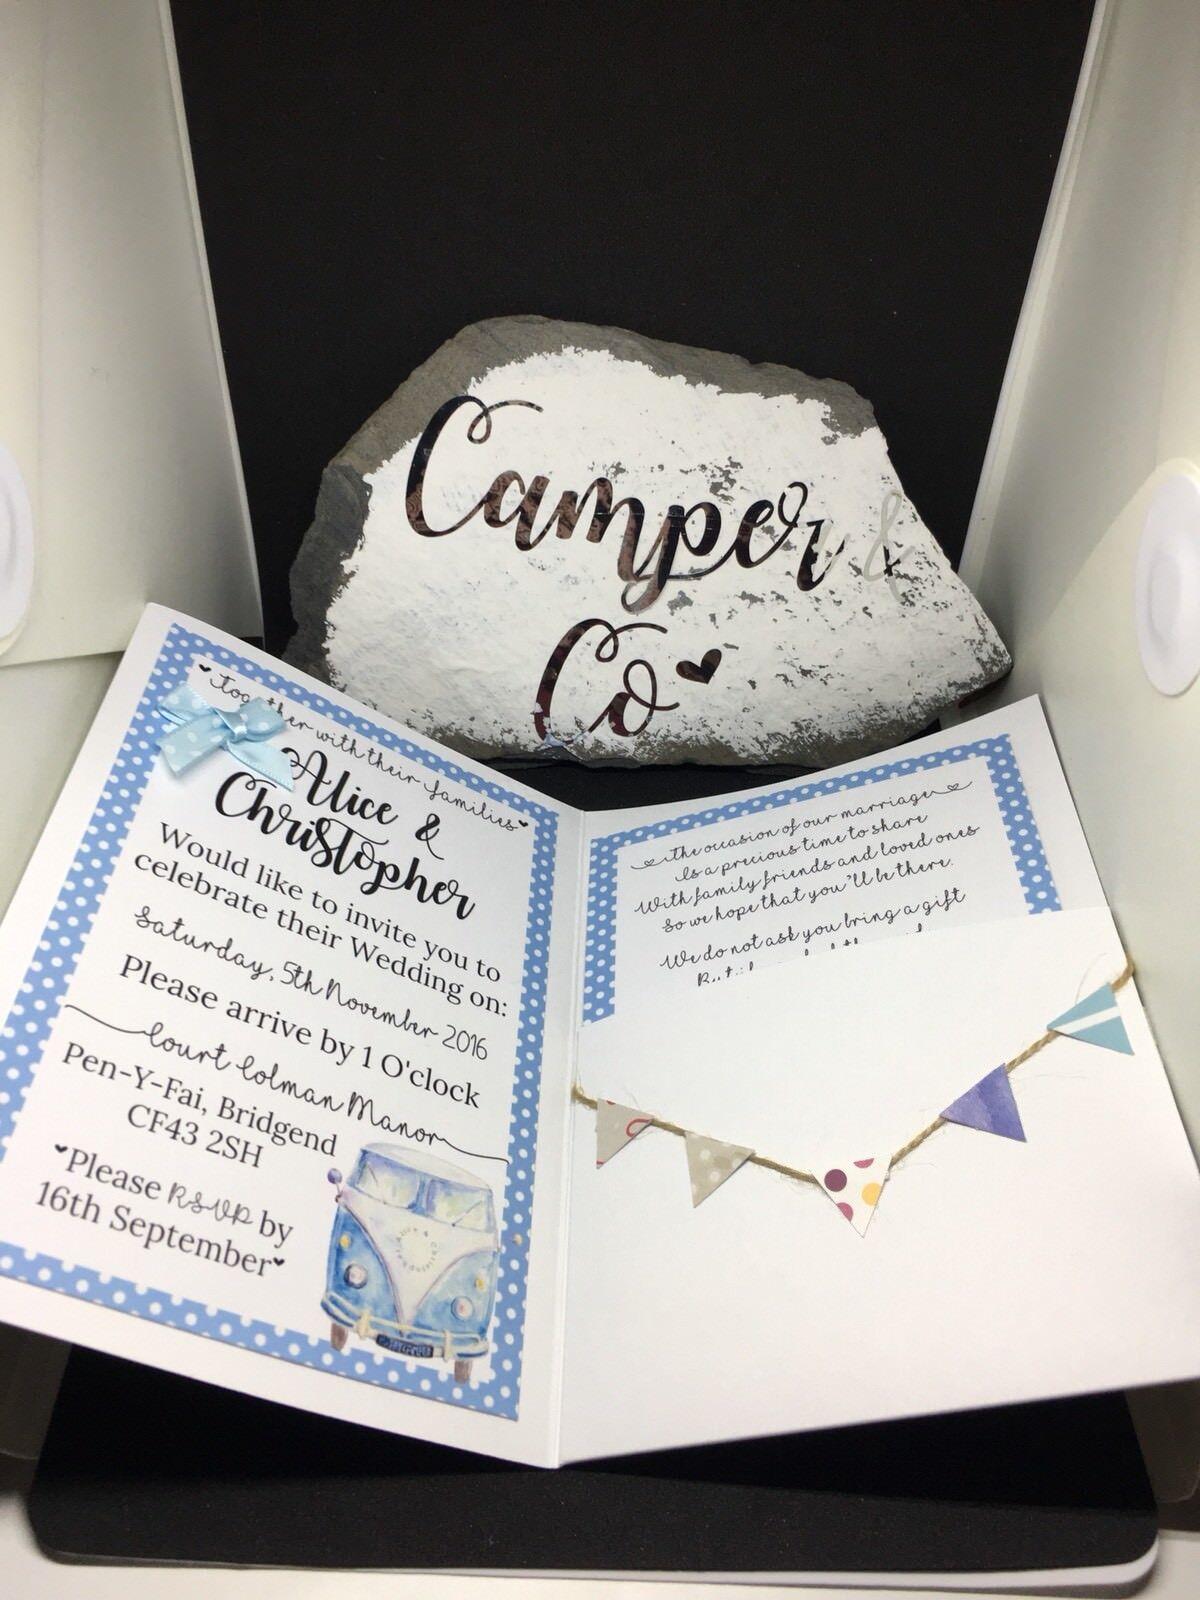 50 entièreHommes t personnalisables Campervan livret mariage livret Campervan invitations-RSVP, poème & envel 81419c